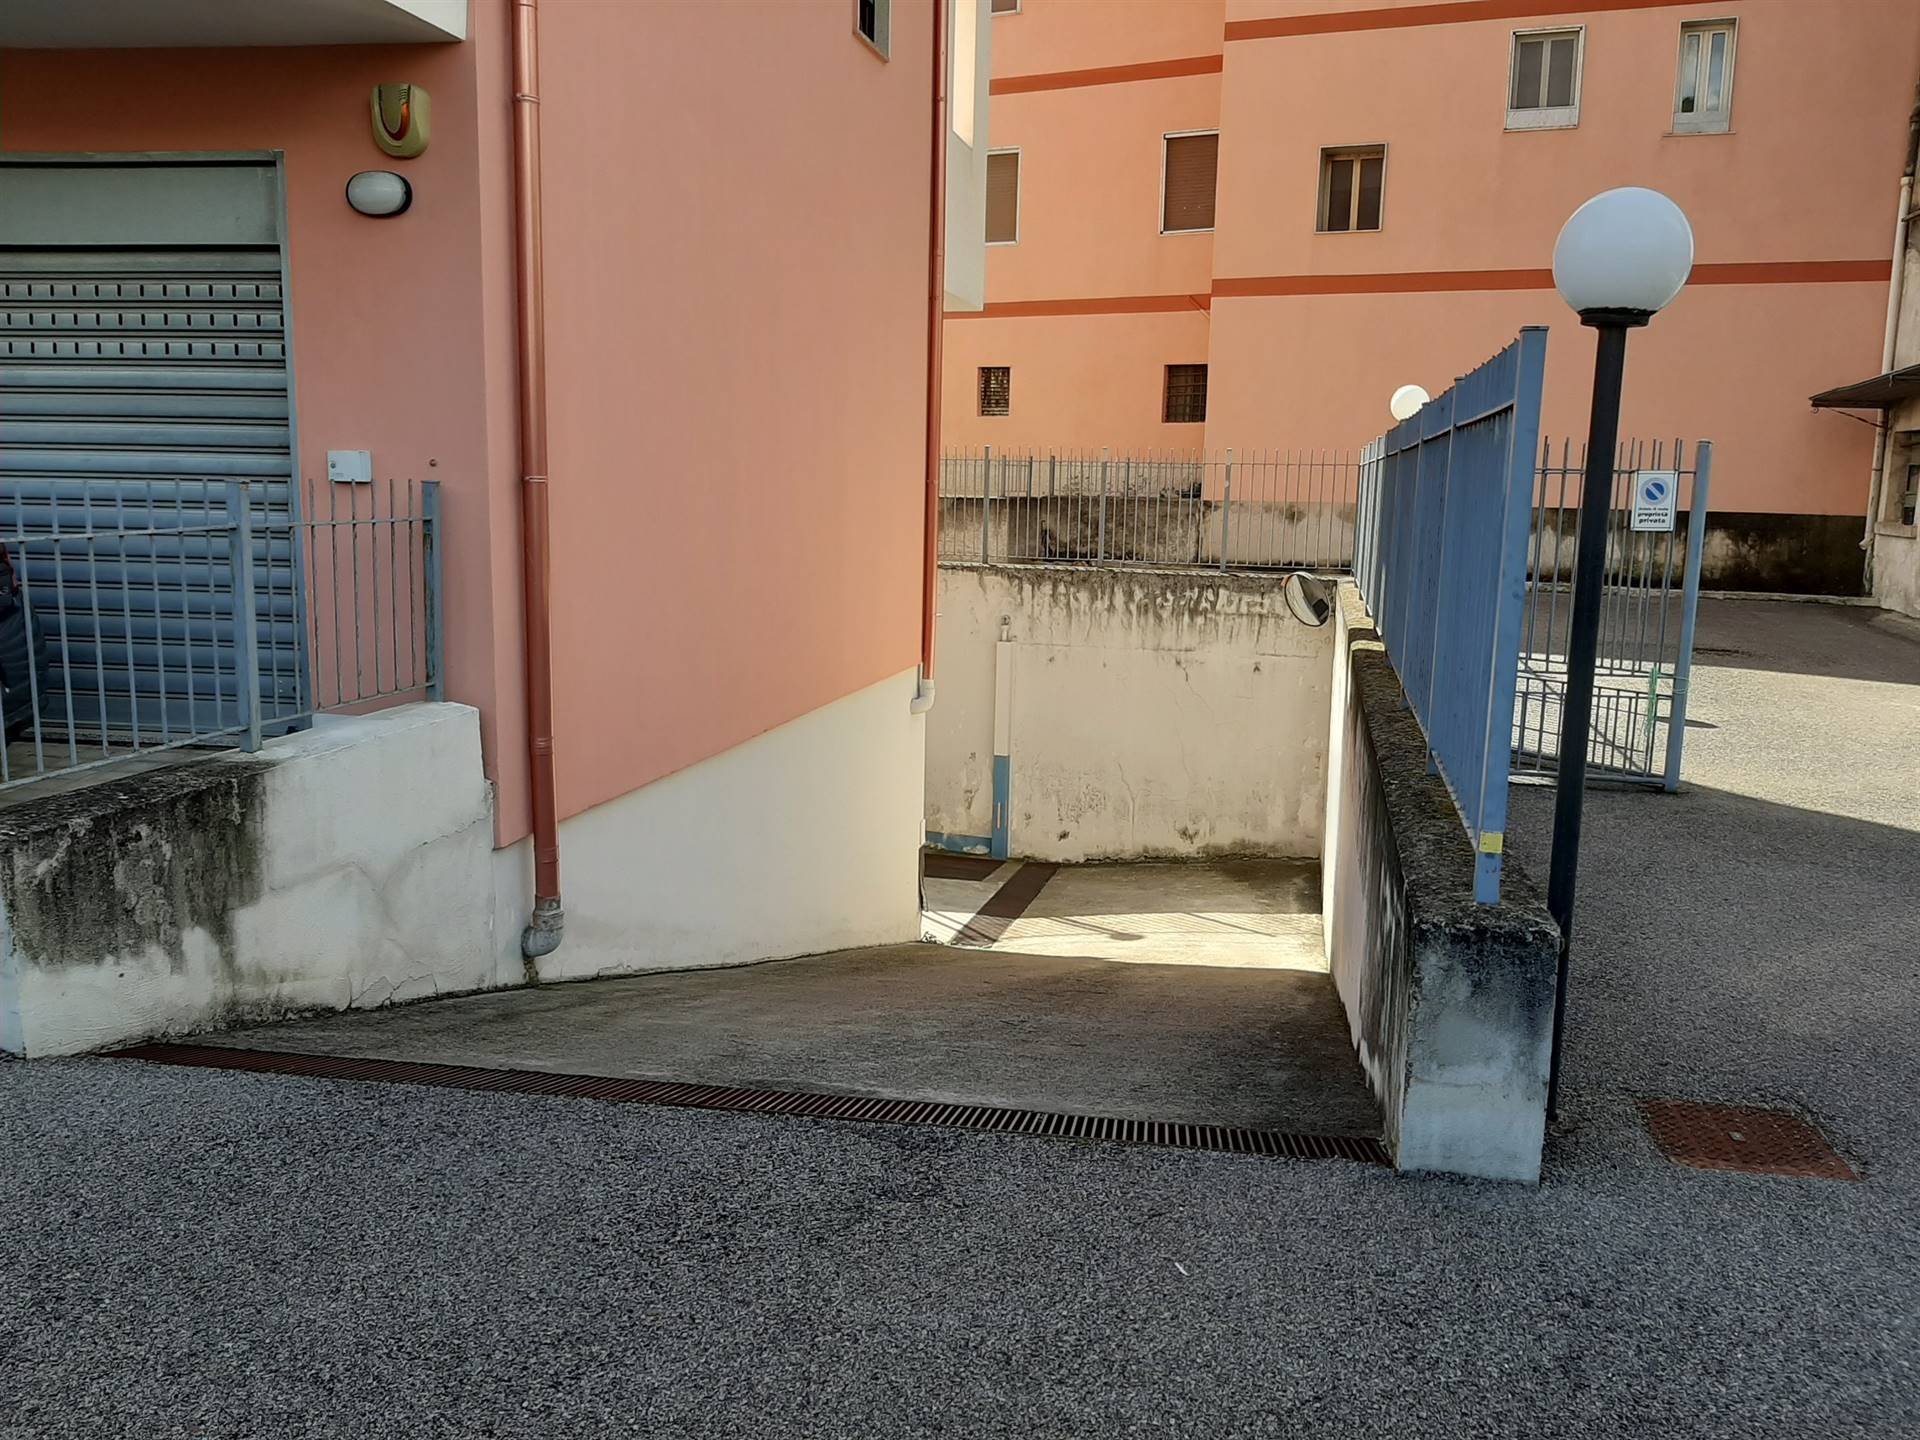 accesso ai garages